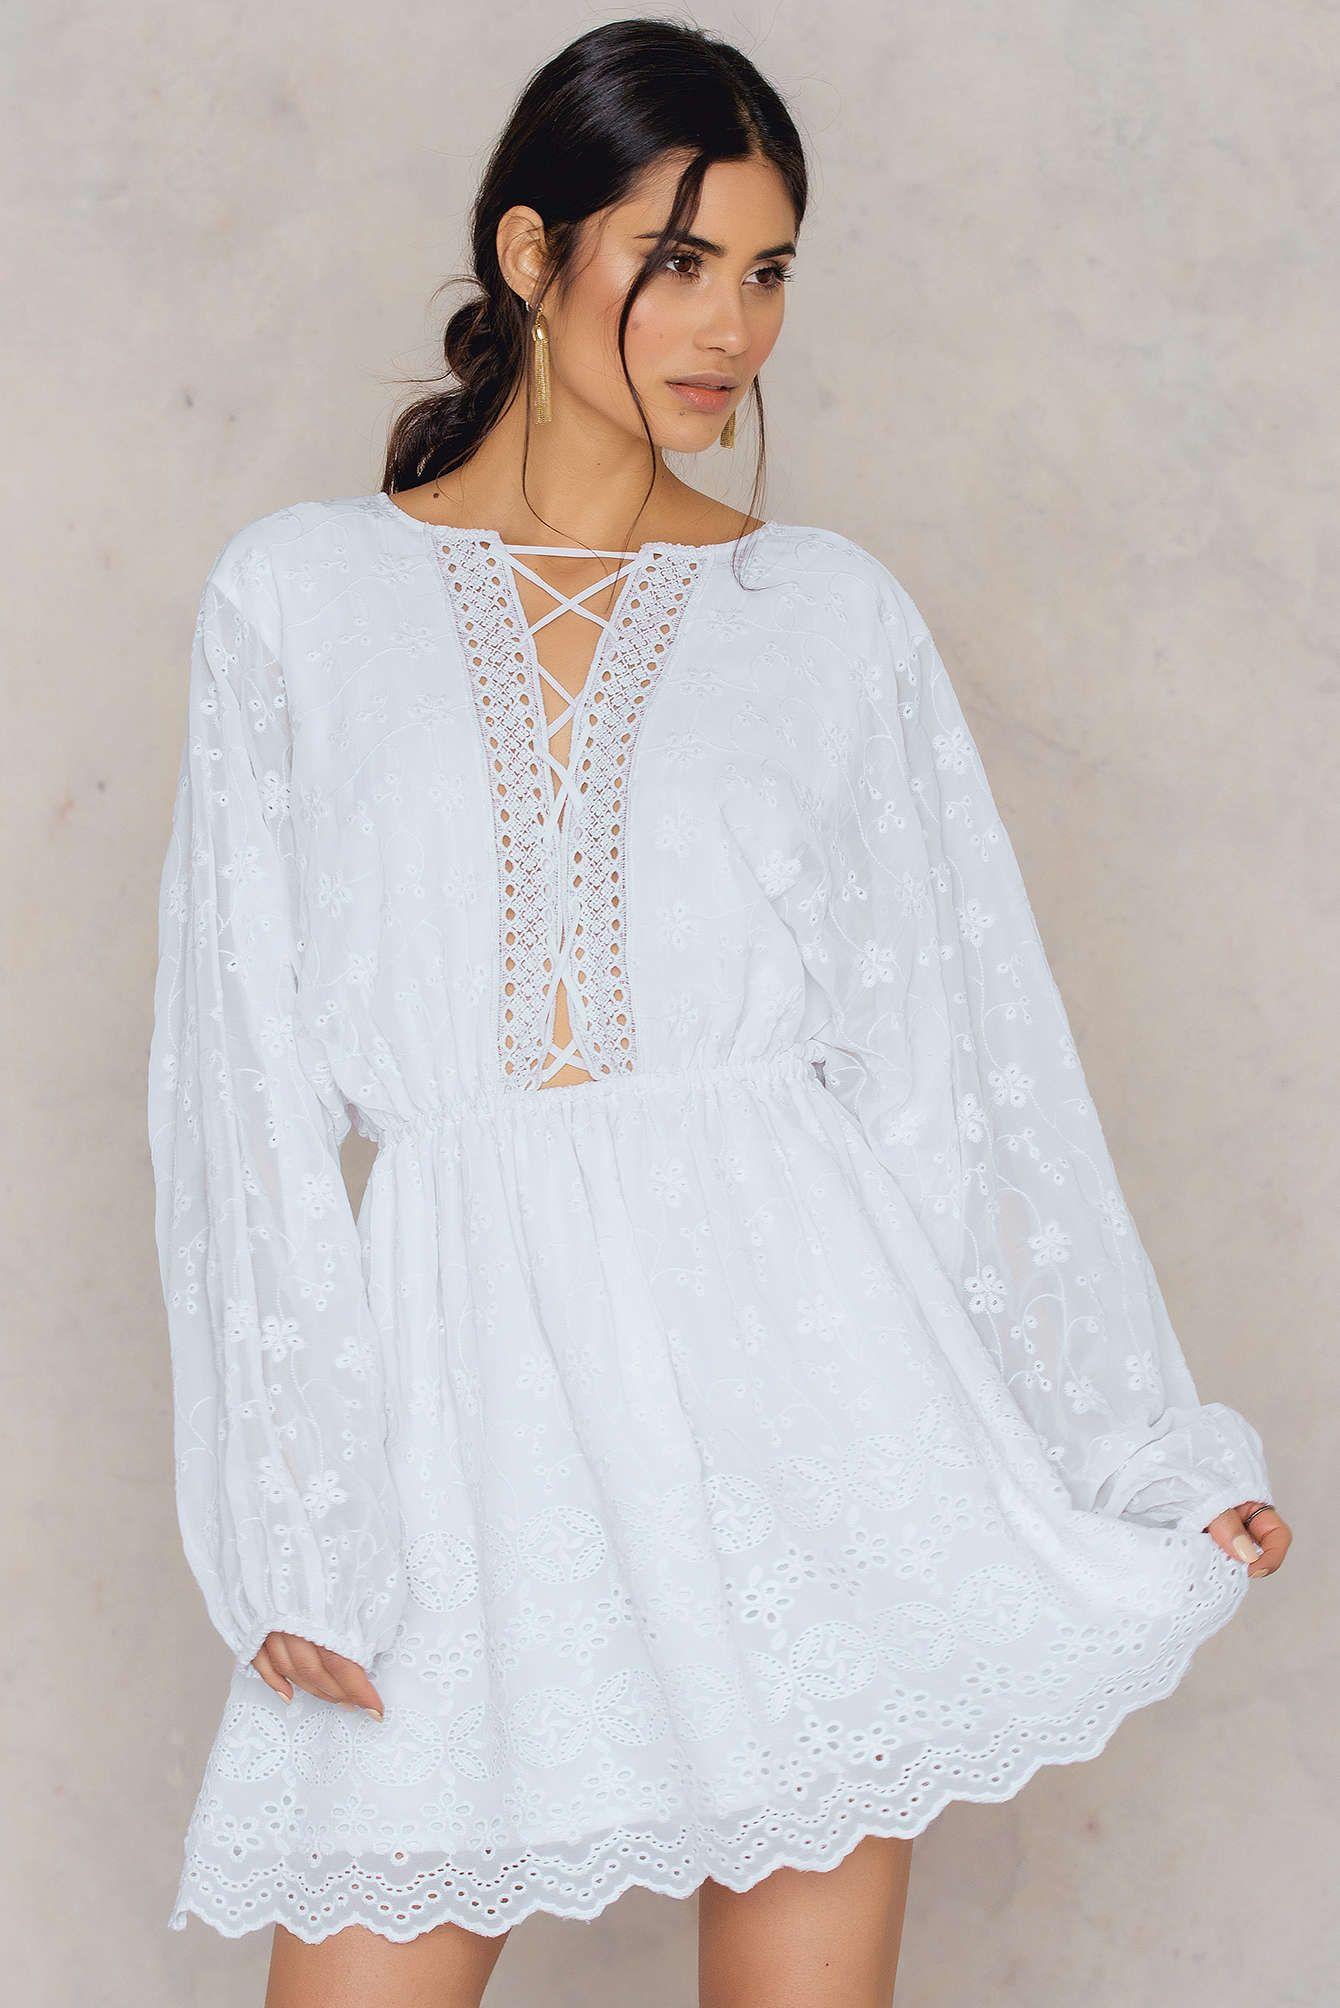 The Lace Up Lace Dress By Na Kd Boho Kruzhevnoe Plate Beloe Kruzhevnoe Plate Platya [ 2008 x 1340 Pixel ]